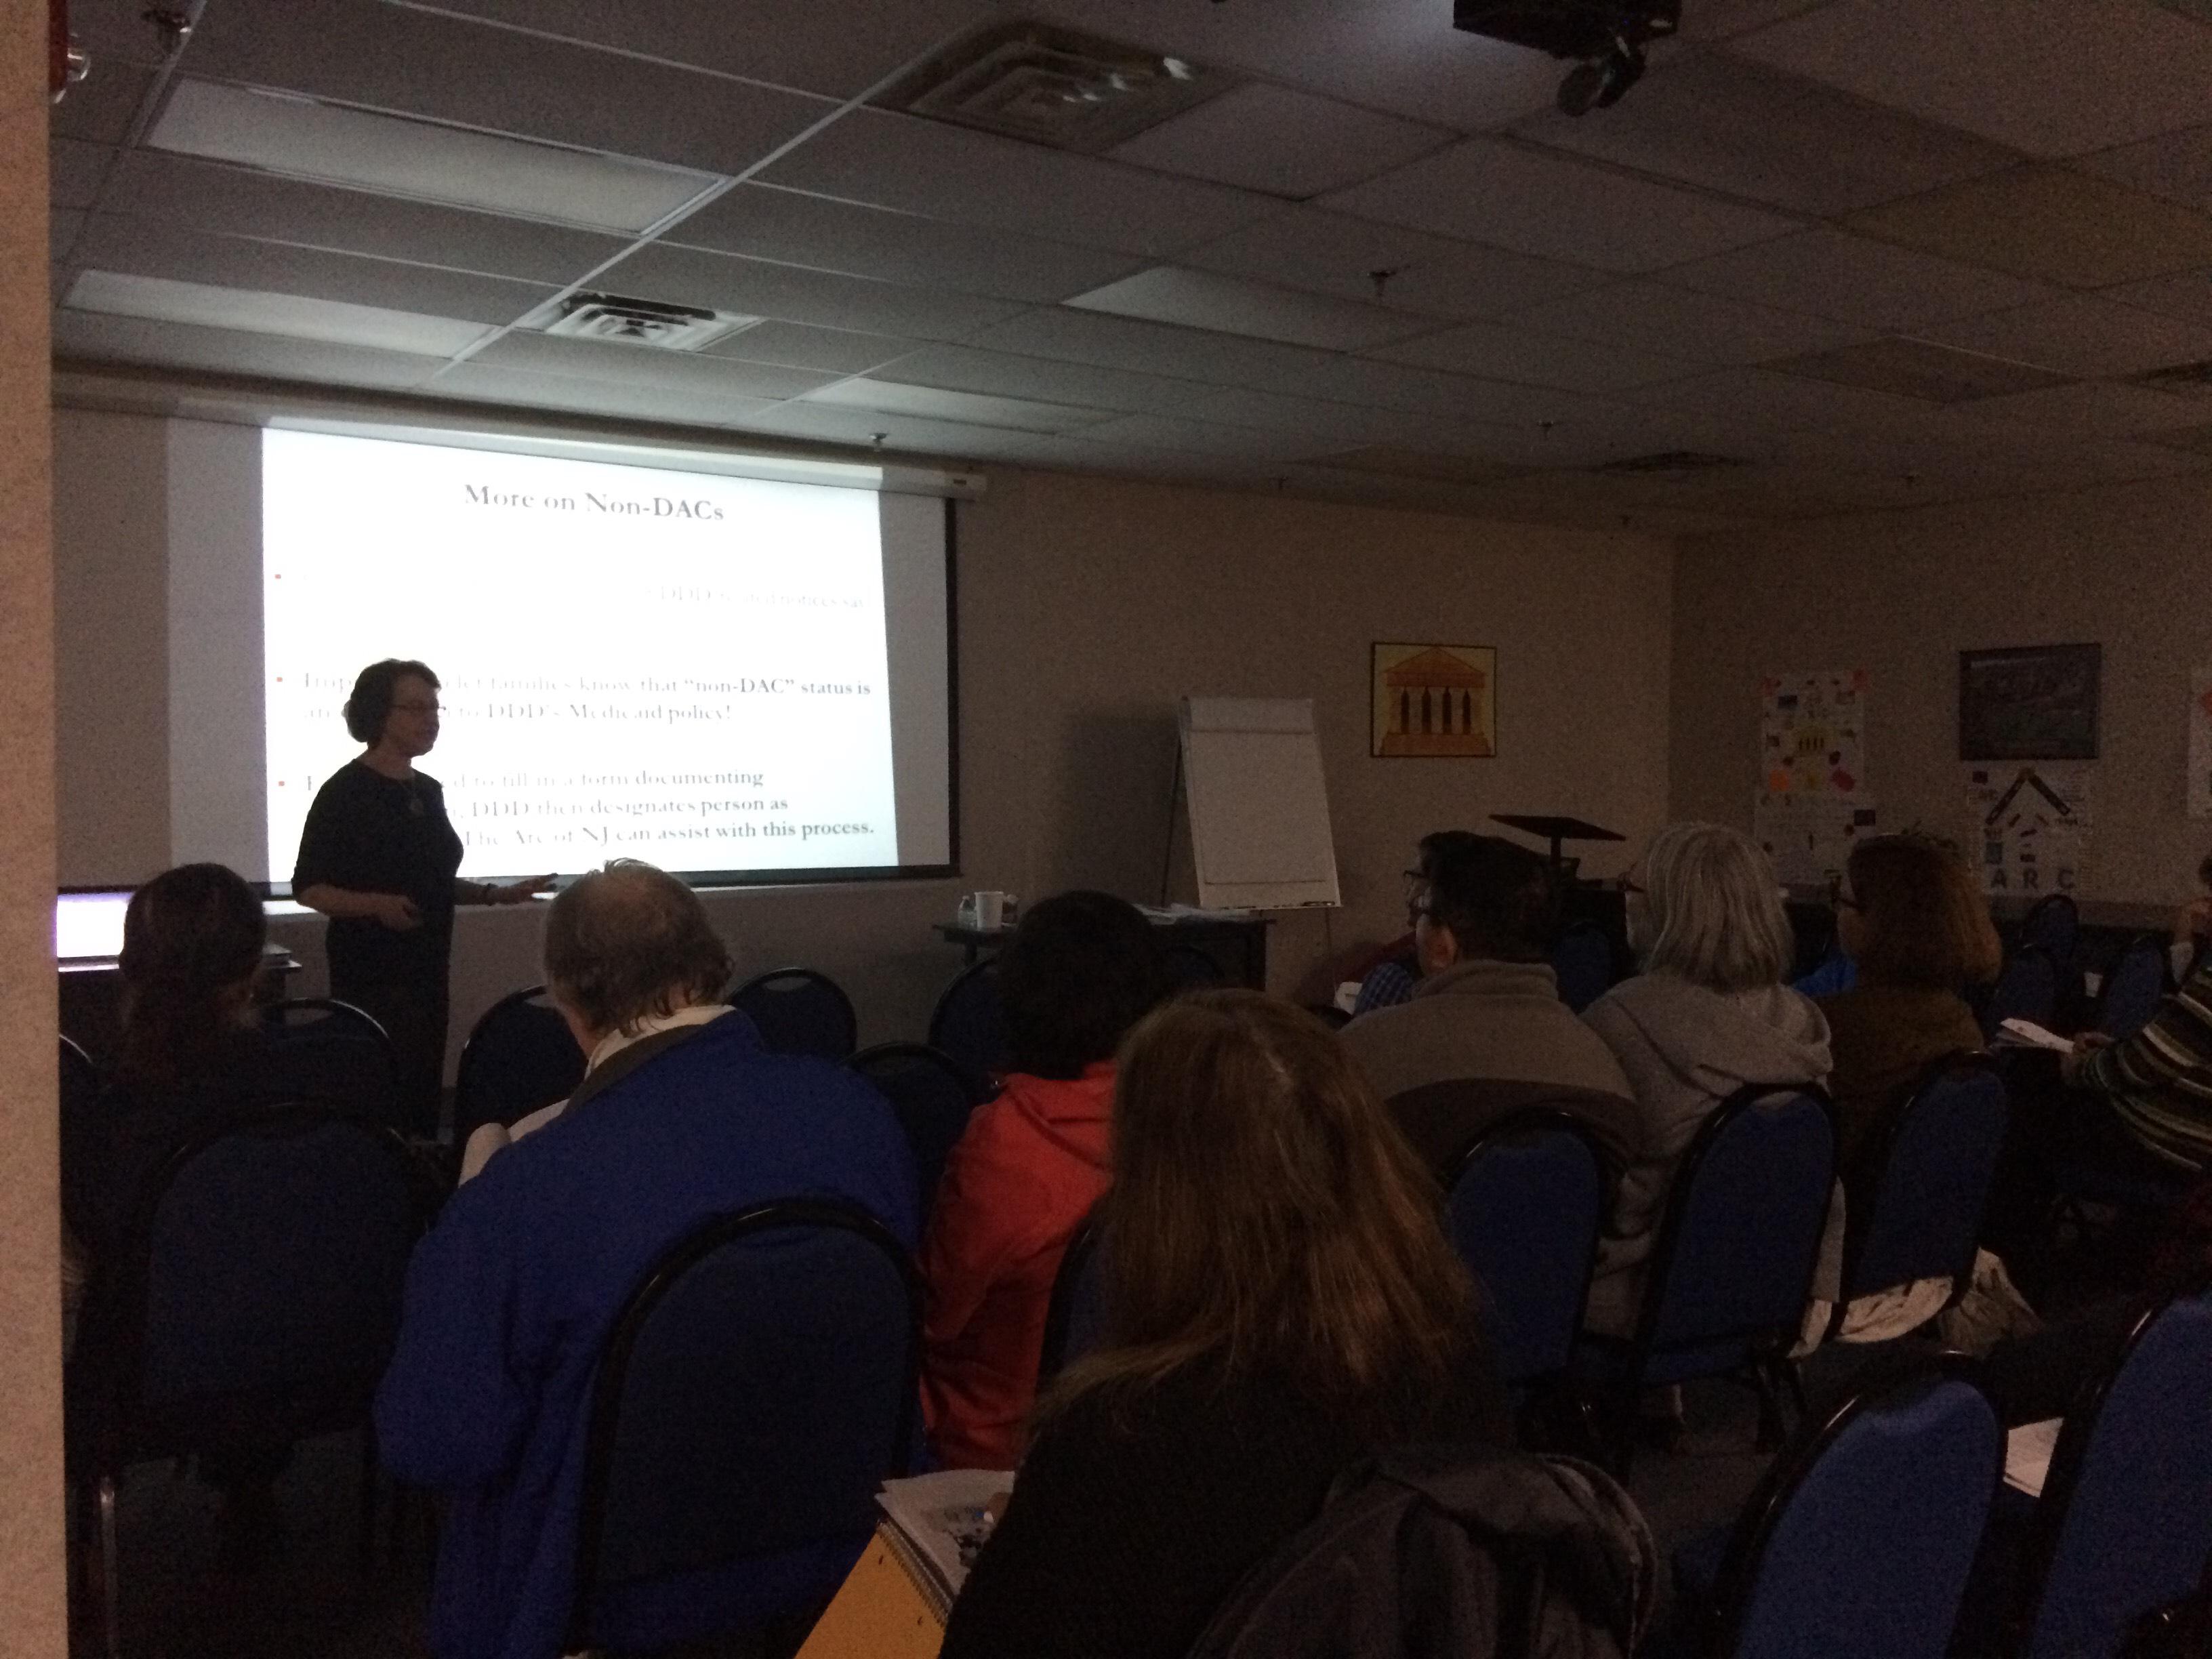 SSI and Medicaid Presentation